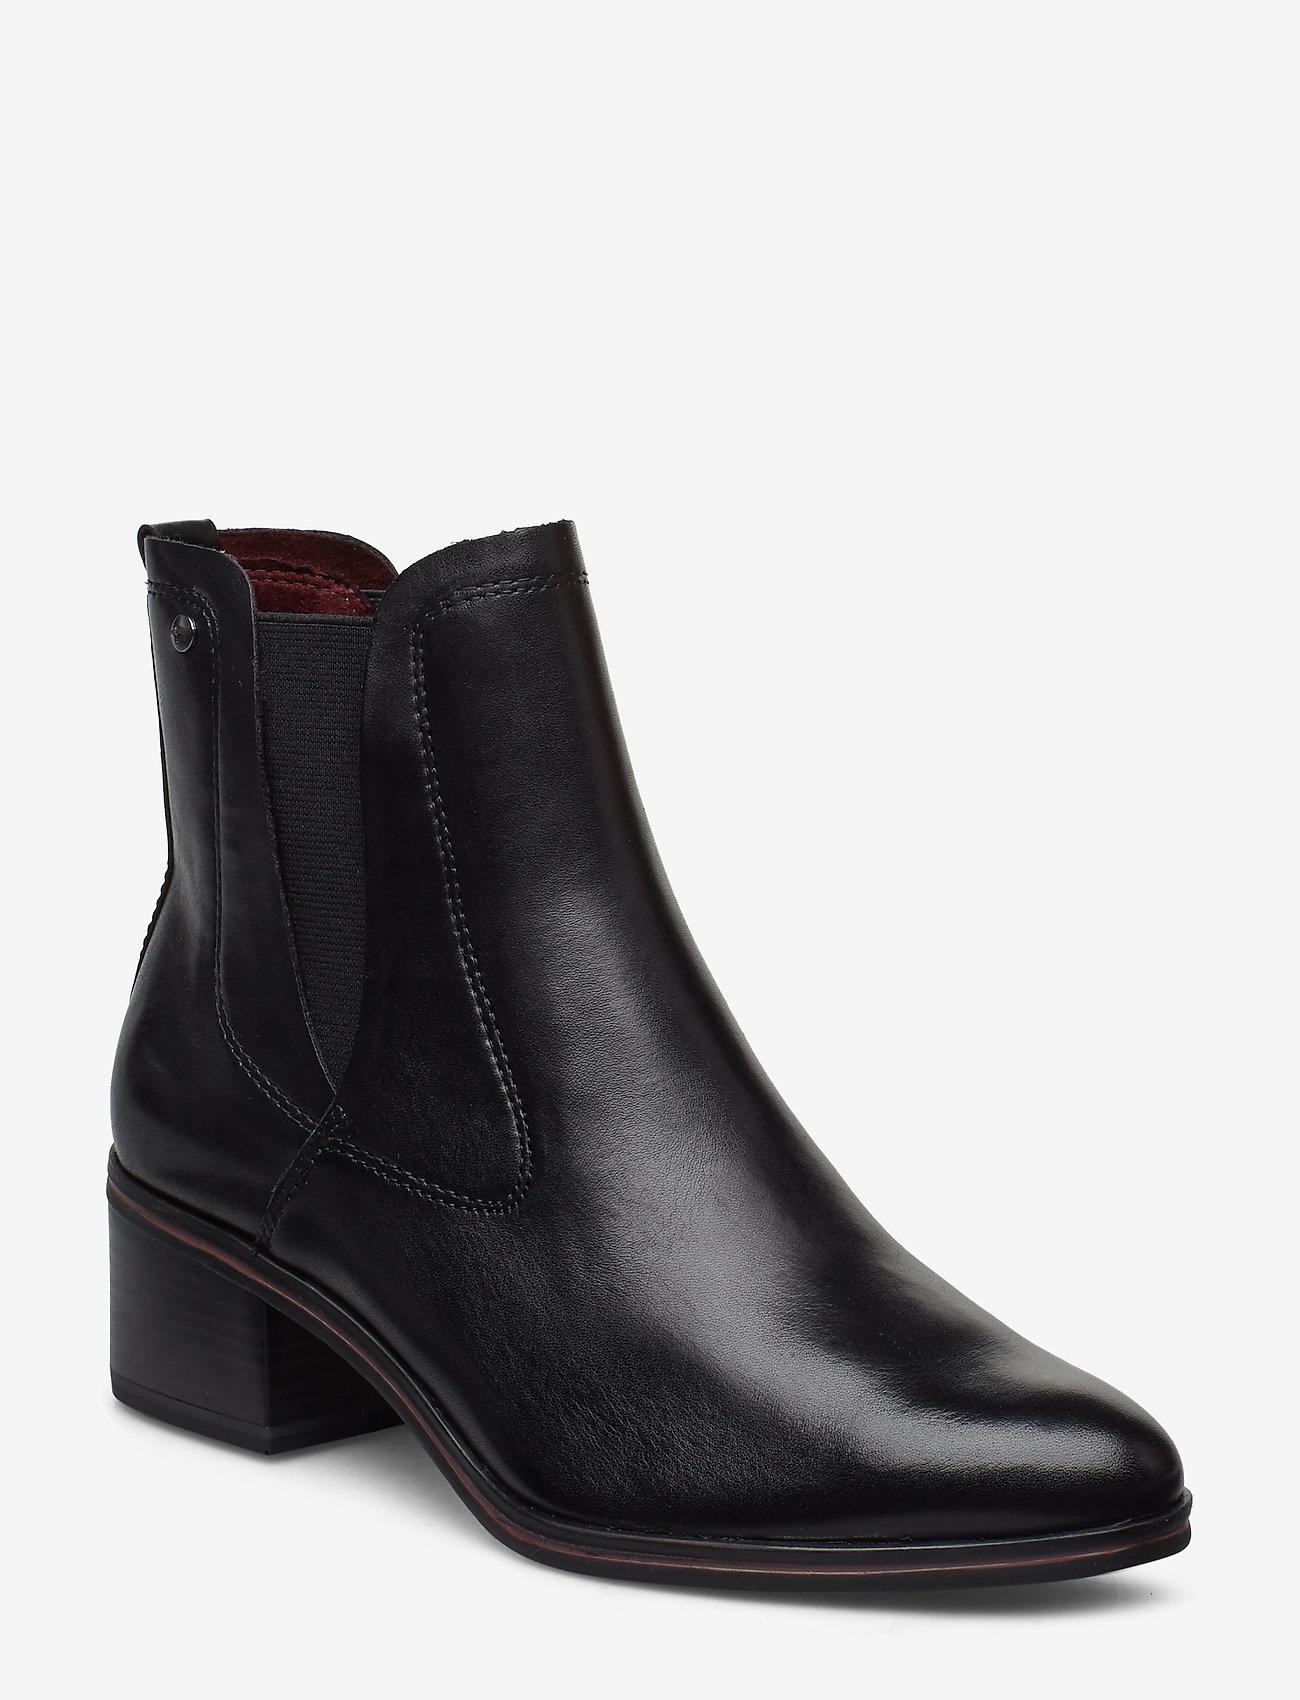 Tamaris - Boots - ankelboots med klack - black - 0